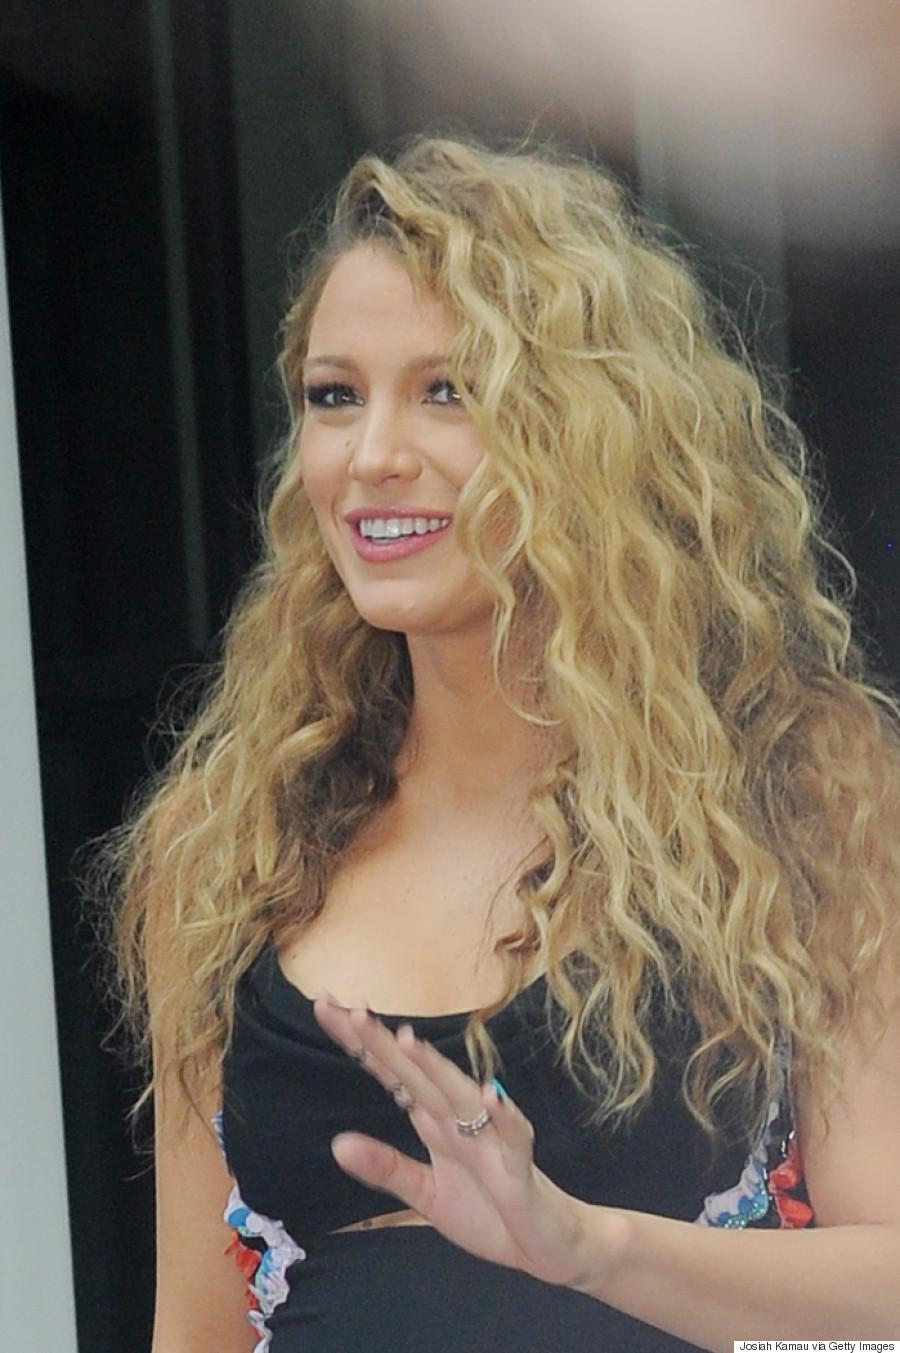 blake lively's big curls